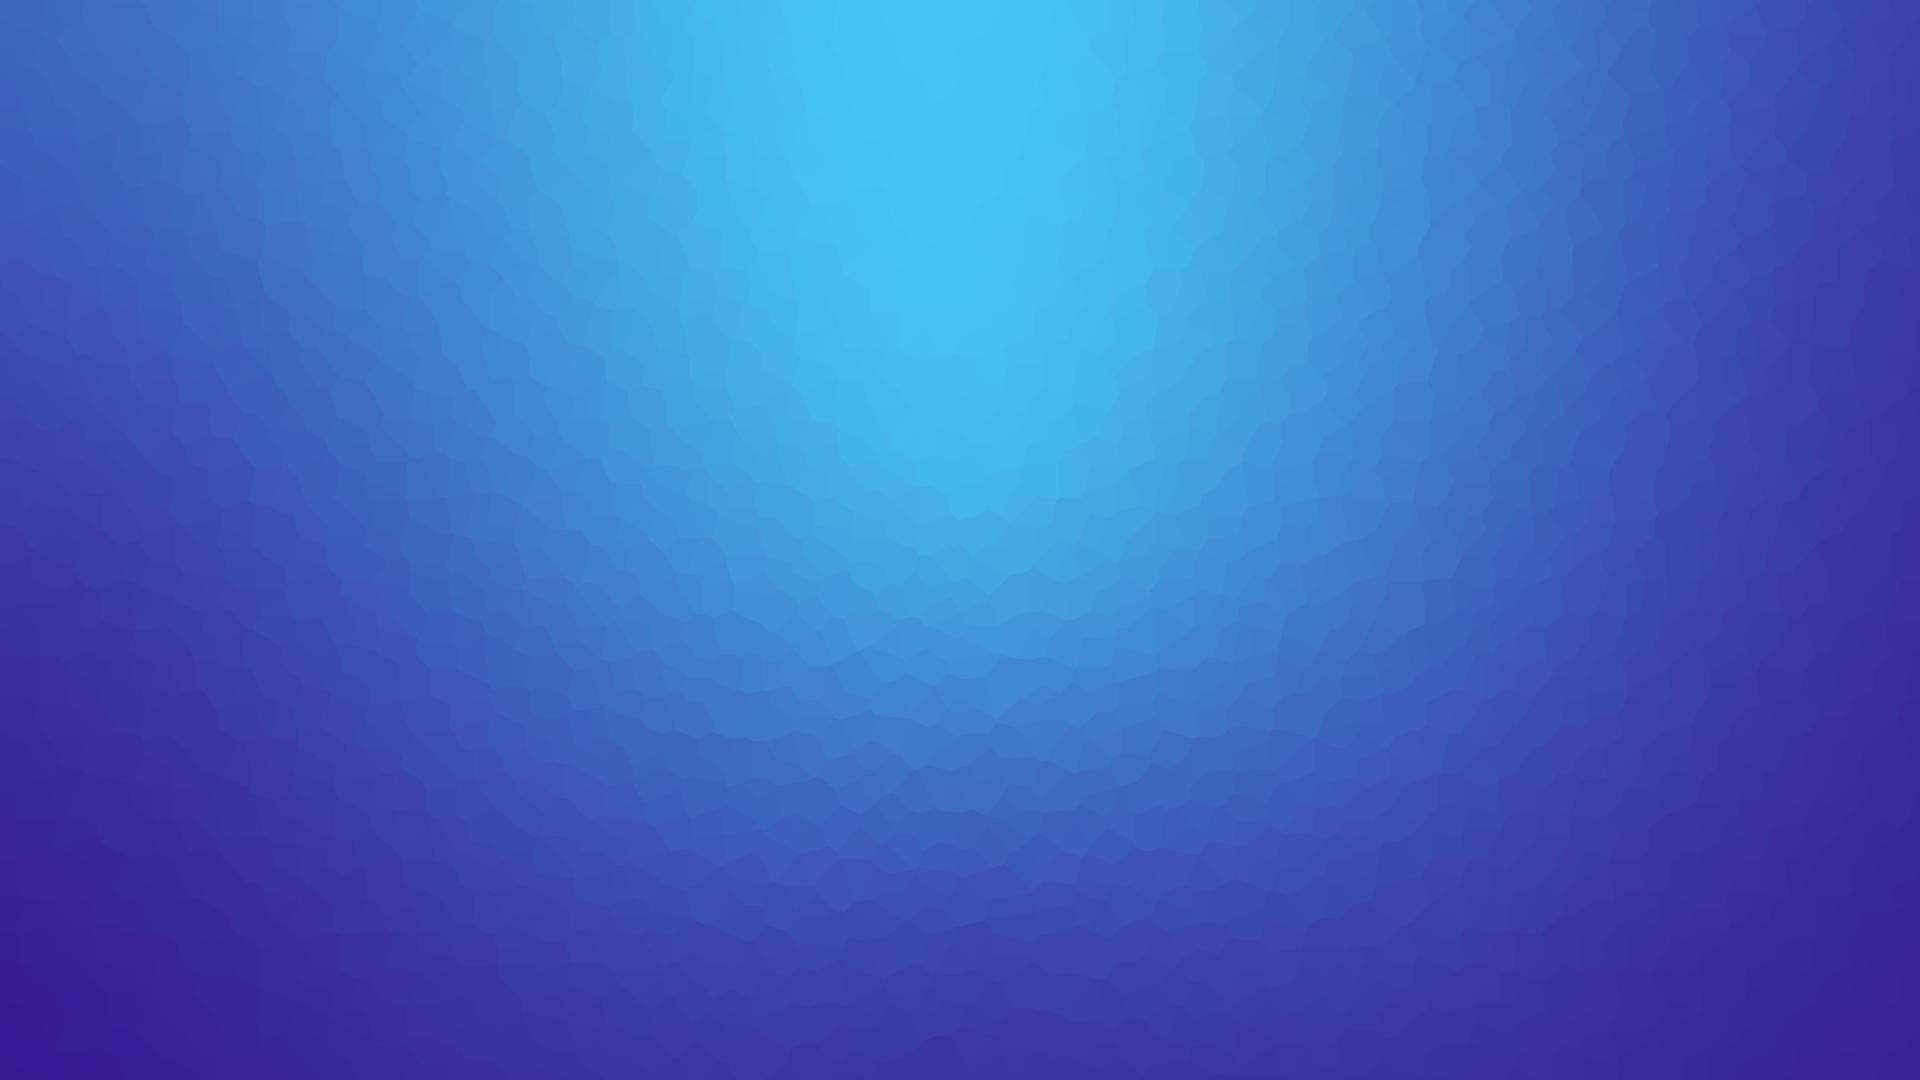 BLUE WALLPAPER 4K CLEAN FOR LAPTOP MACBOOK DESKTOP PC